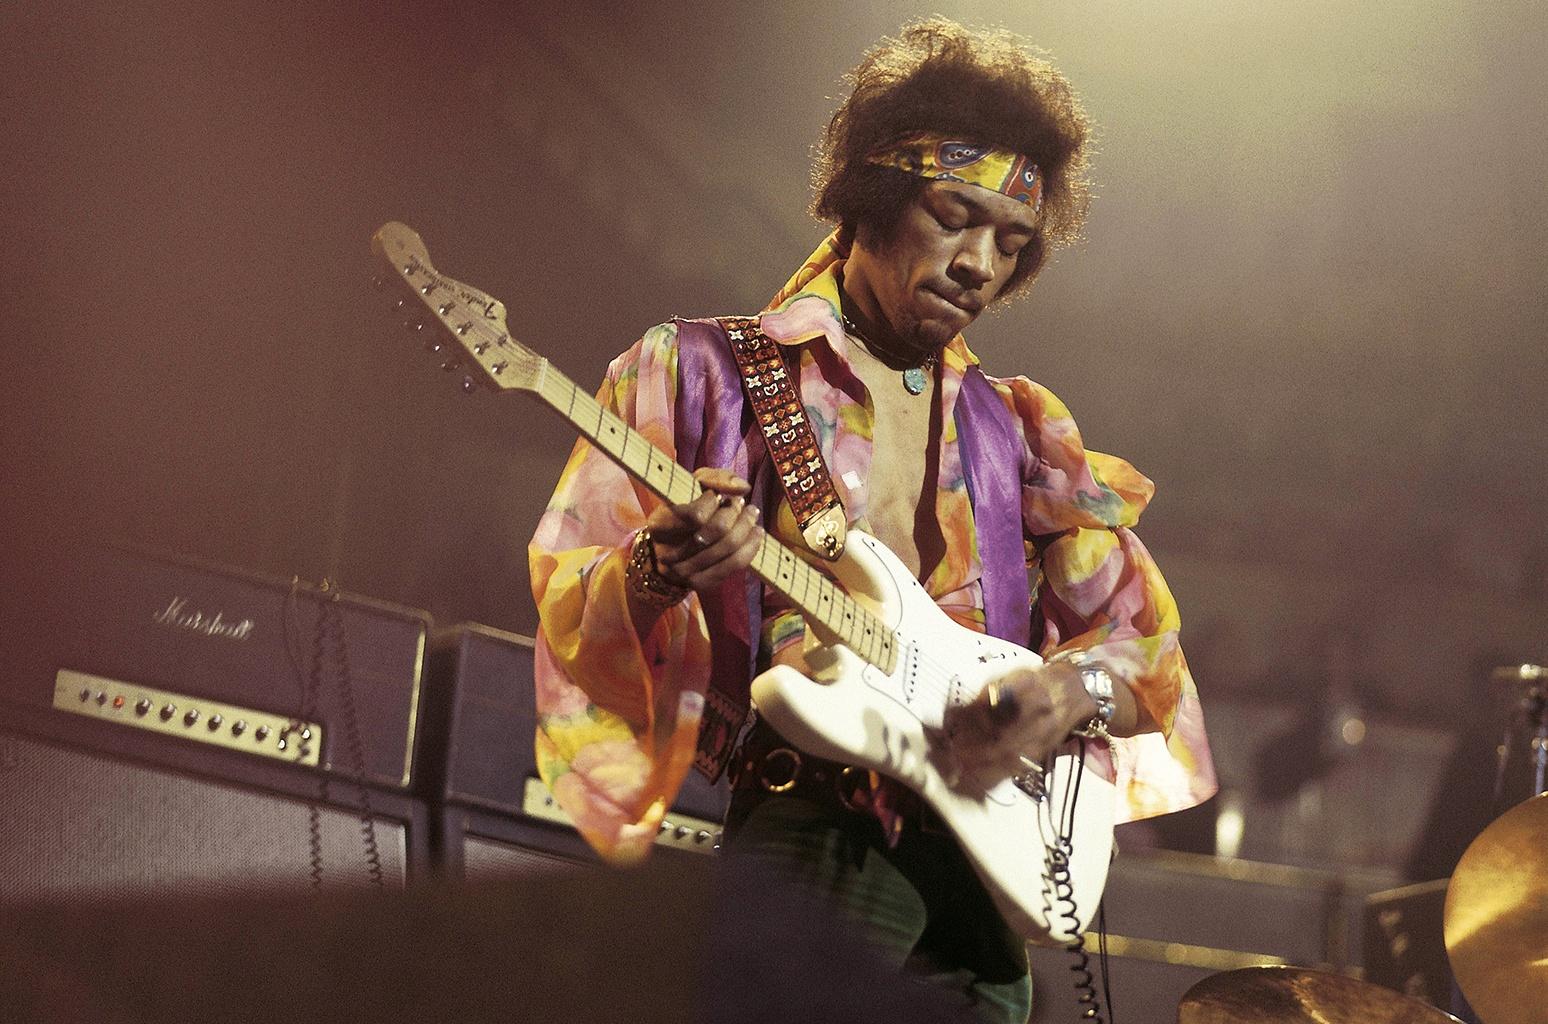 jimi hendrix feb 1969 live billboard 1548 30 Things You Didn't Know About Freddie Mercury